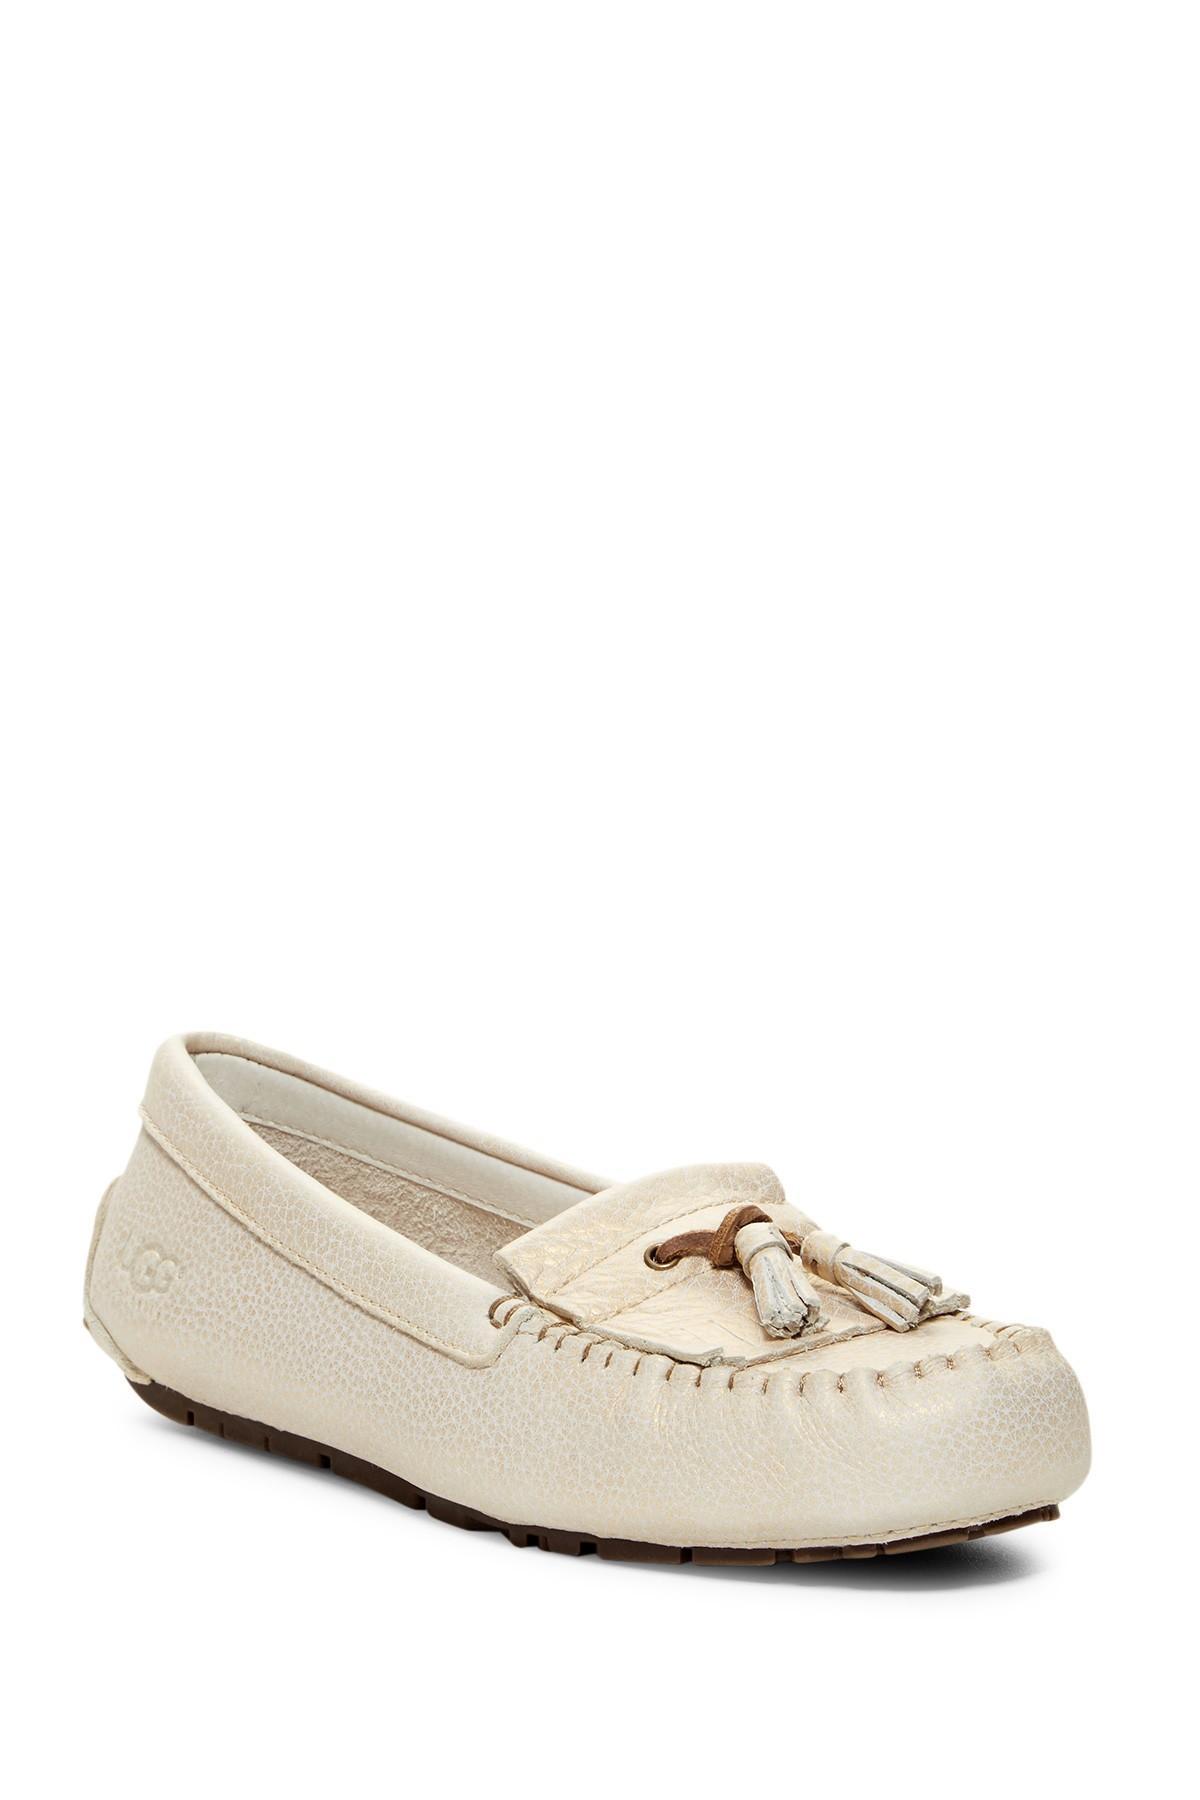 Visvim Women S Shoes